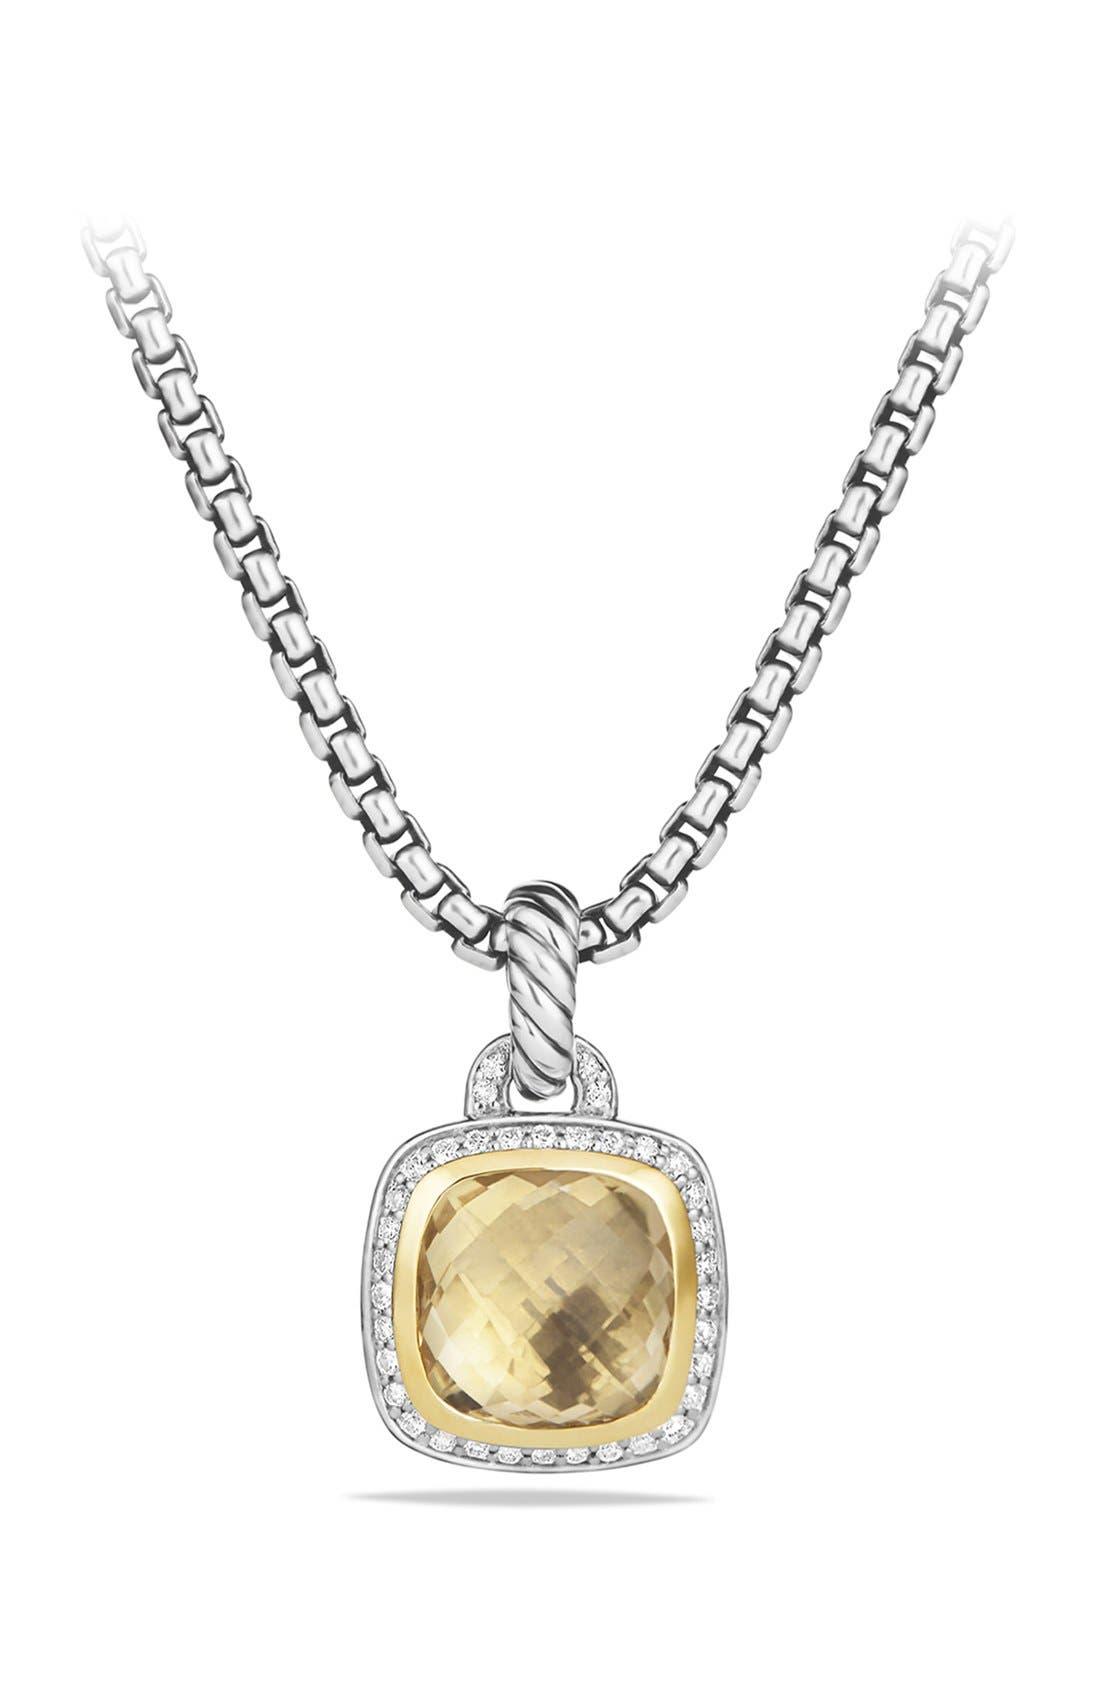 Main Image - David Yurman'Albion' Pendant with Diamonds and 18K Gold